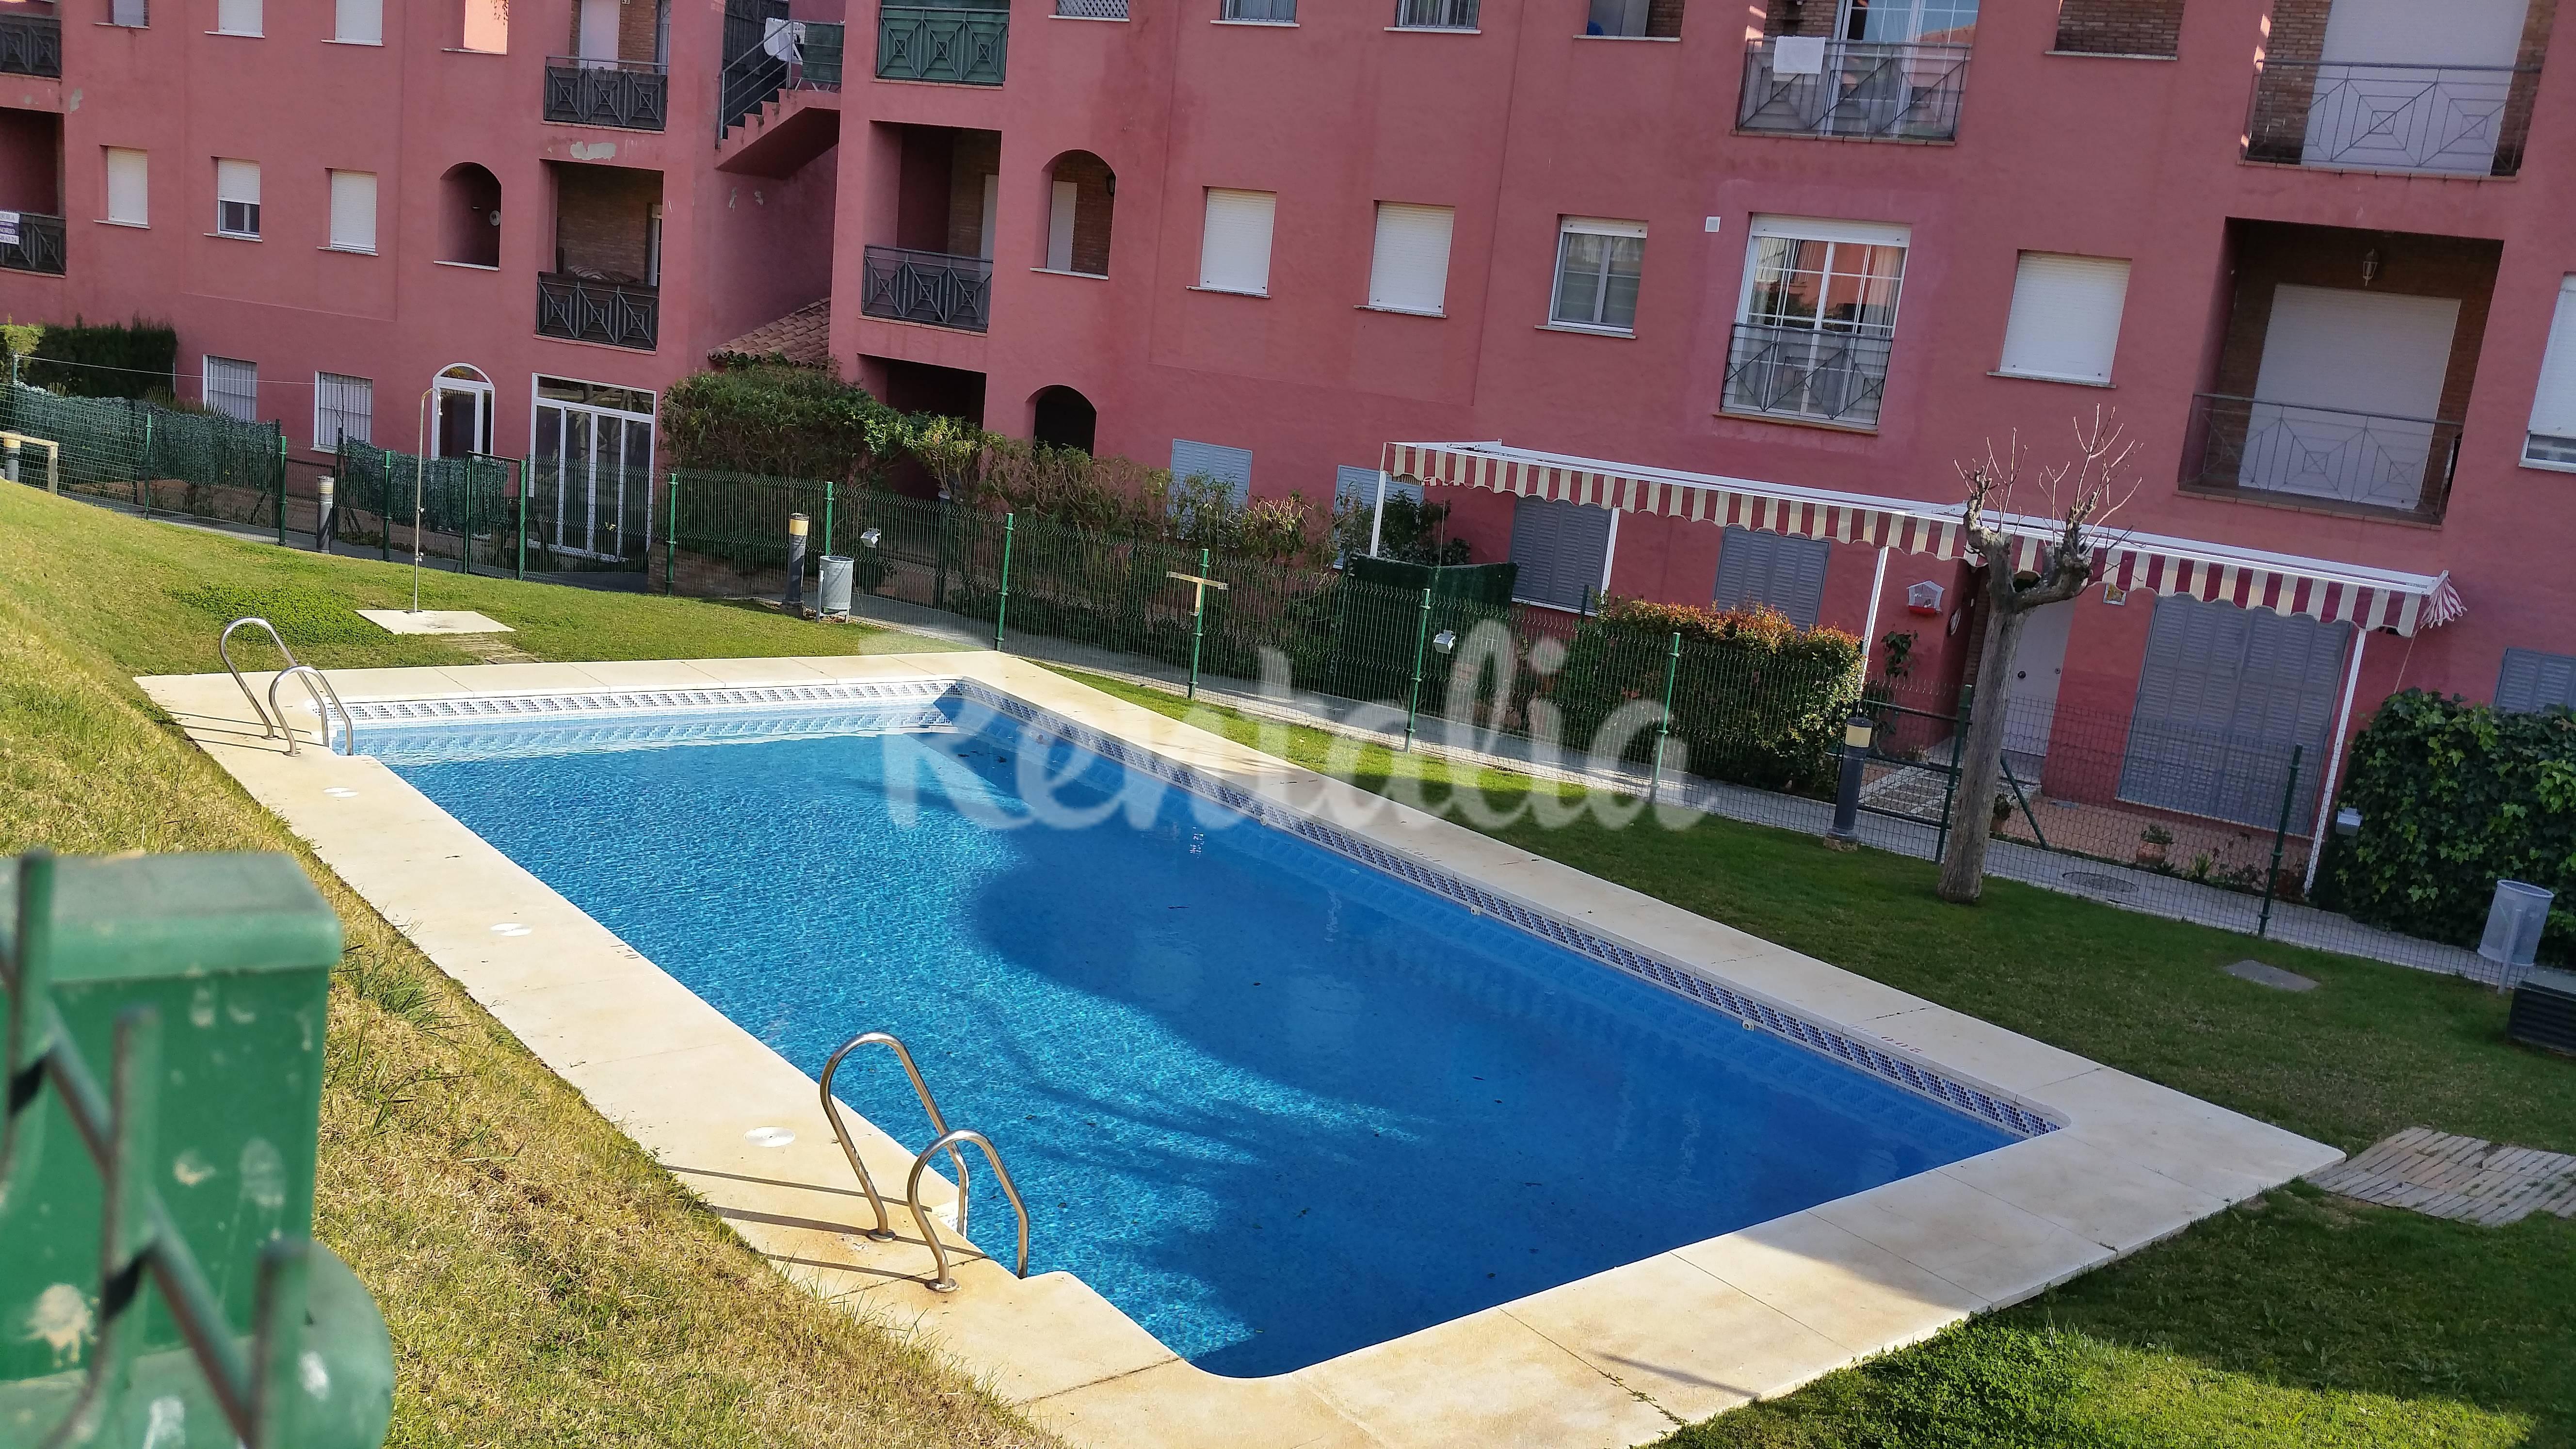 Casa de 3 habitaciones a 400 m de la playa islantilla i - Rentalia islantilla ...